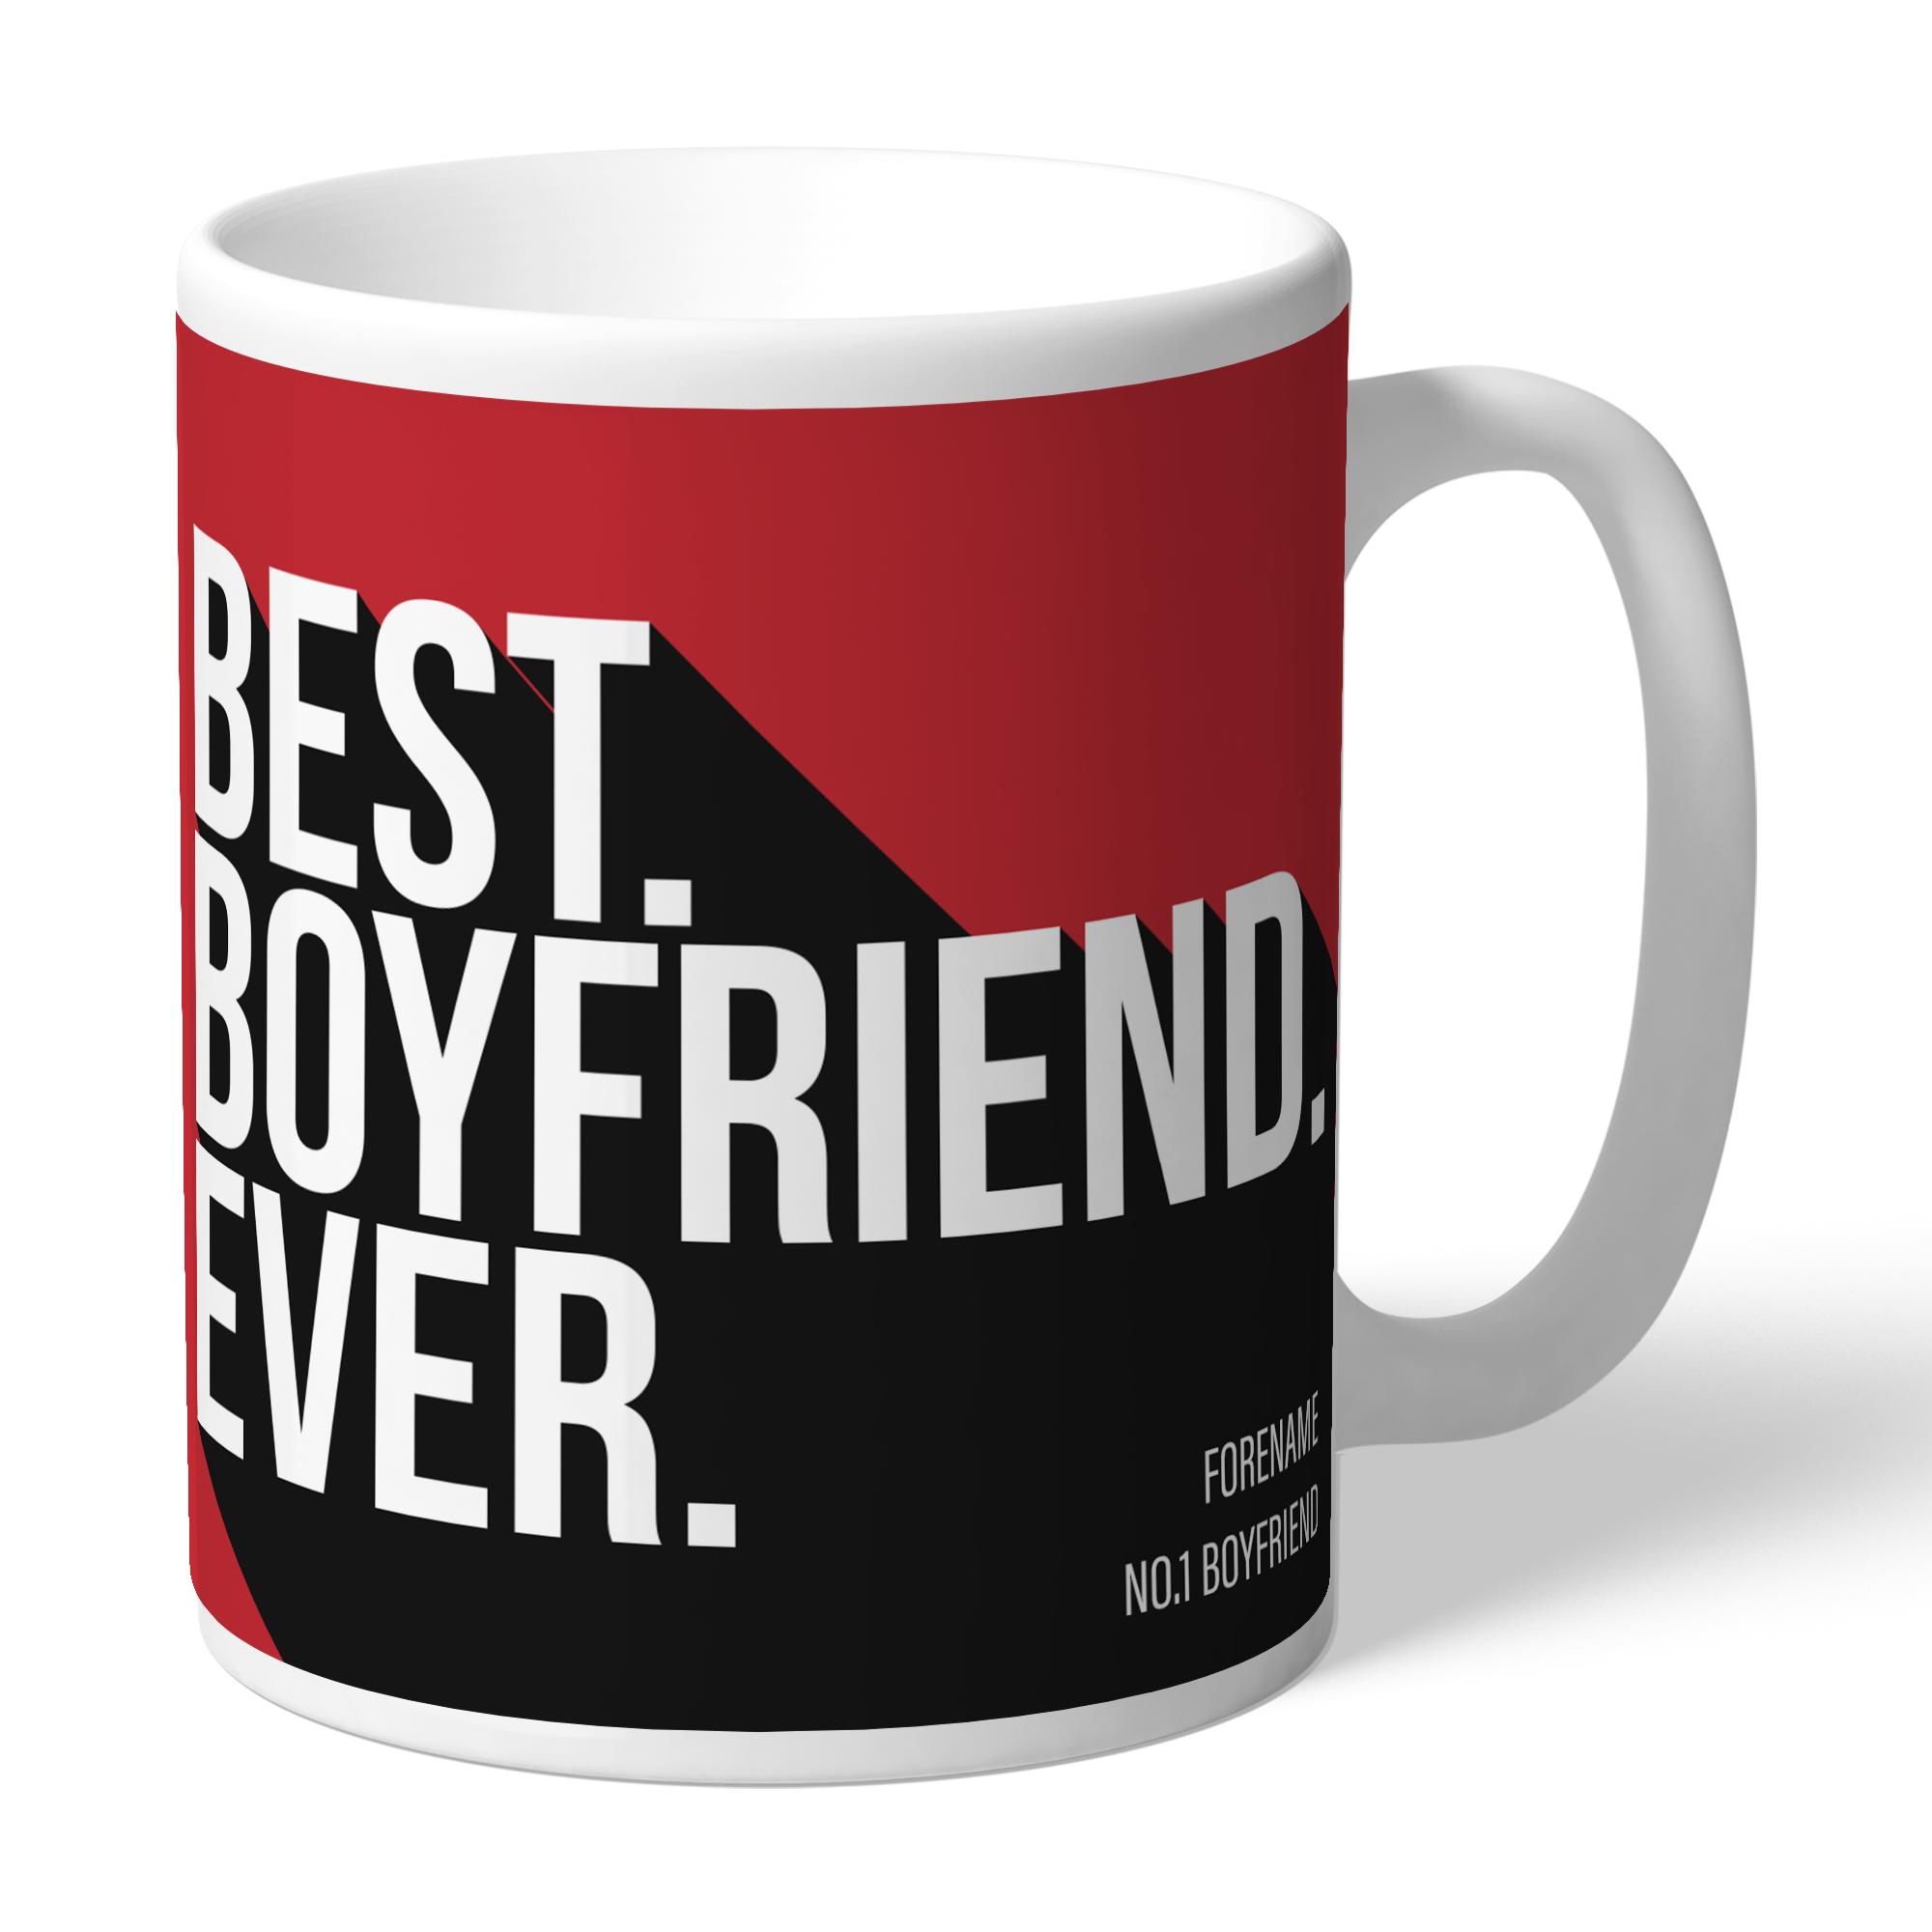 Middlesbrough Best Boyfriend Ever Mug